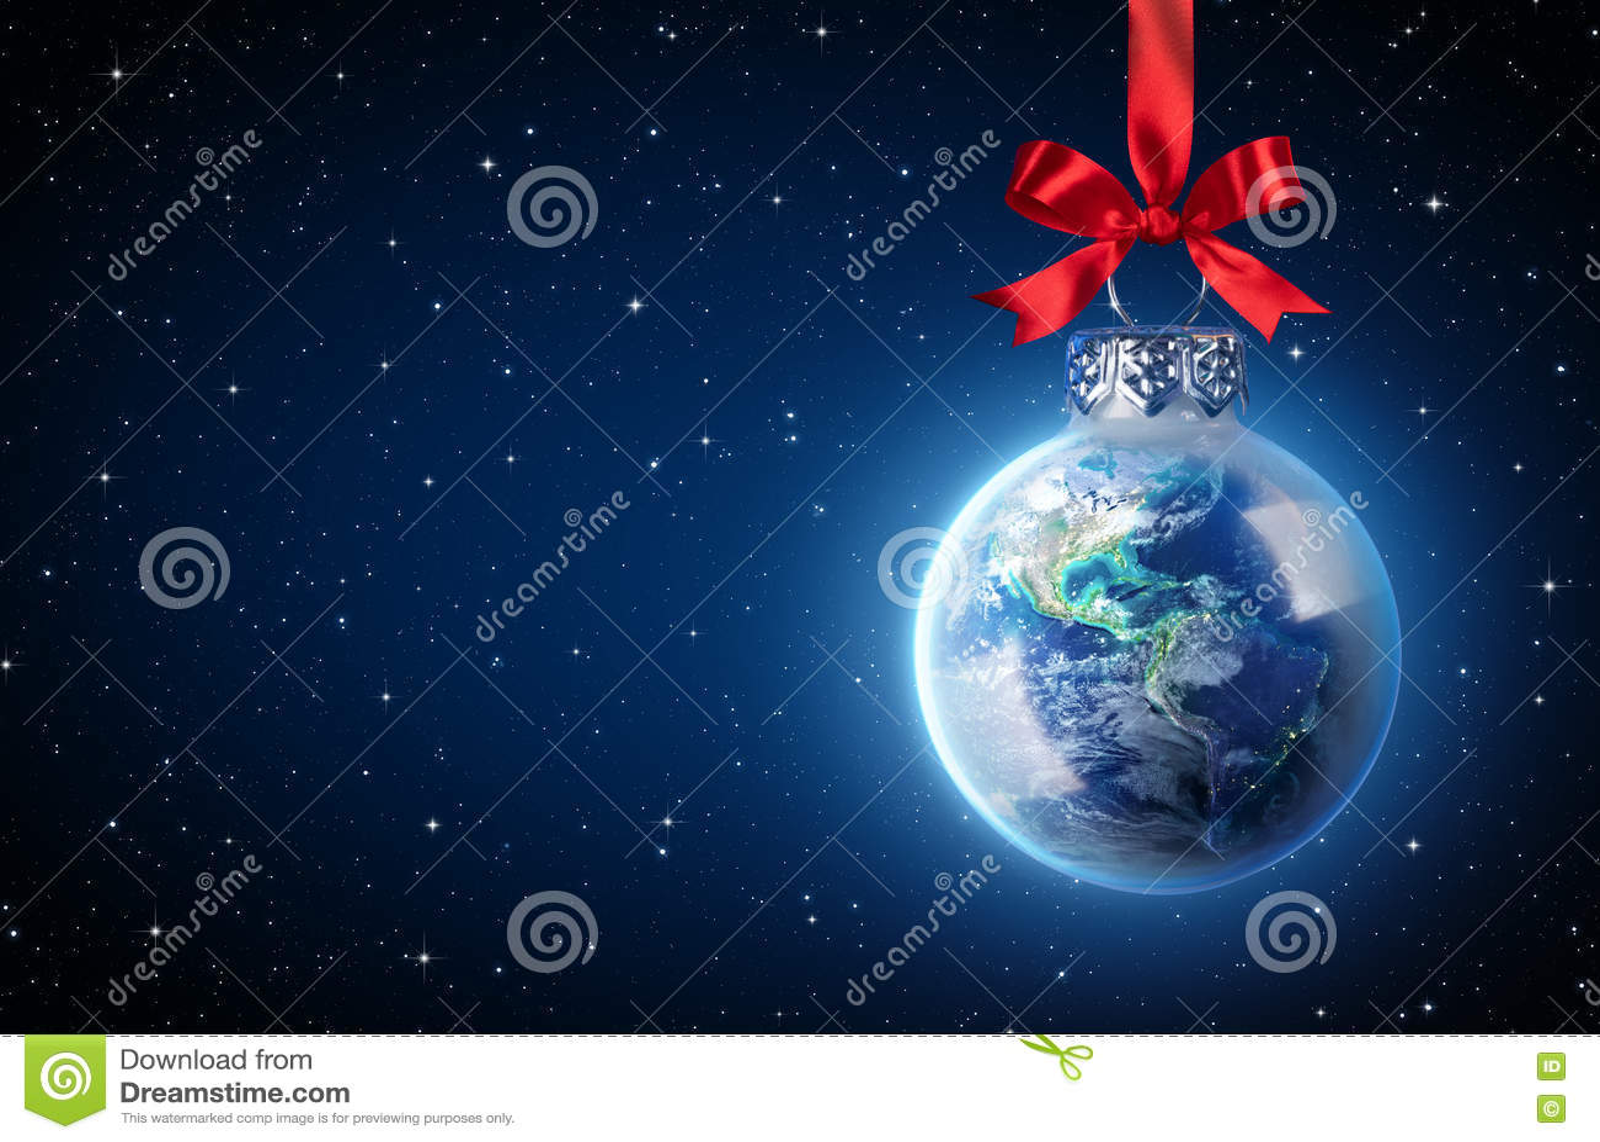 peaceful christmas all over the world - Christmas All Over The World